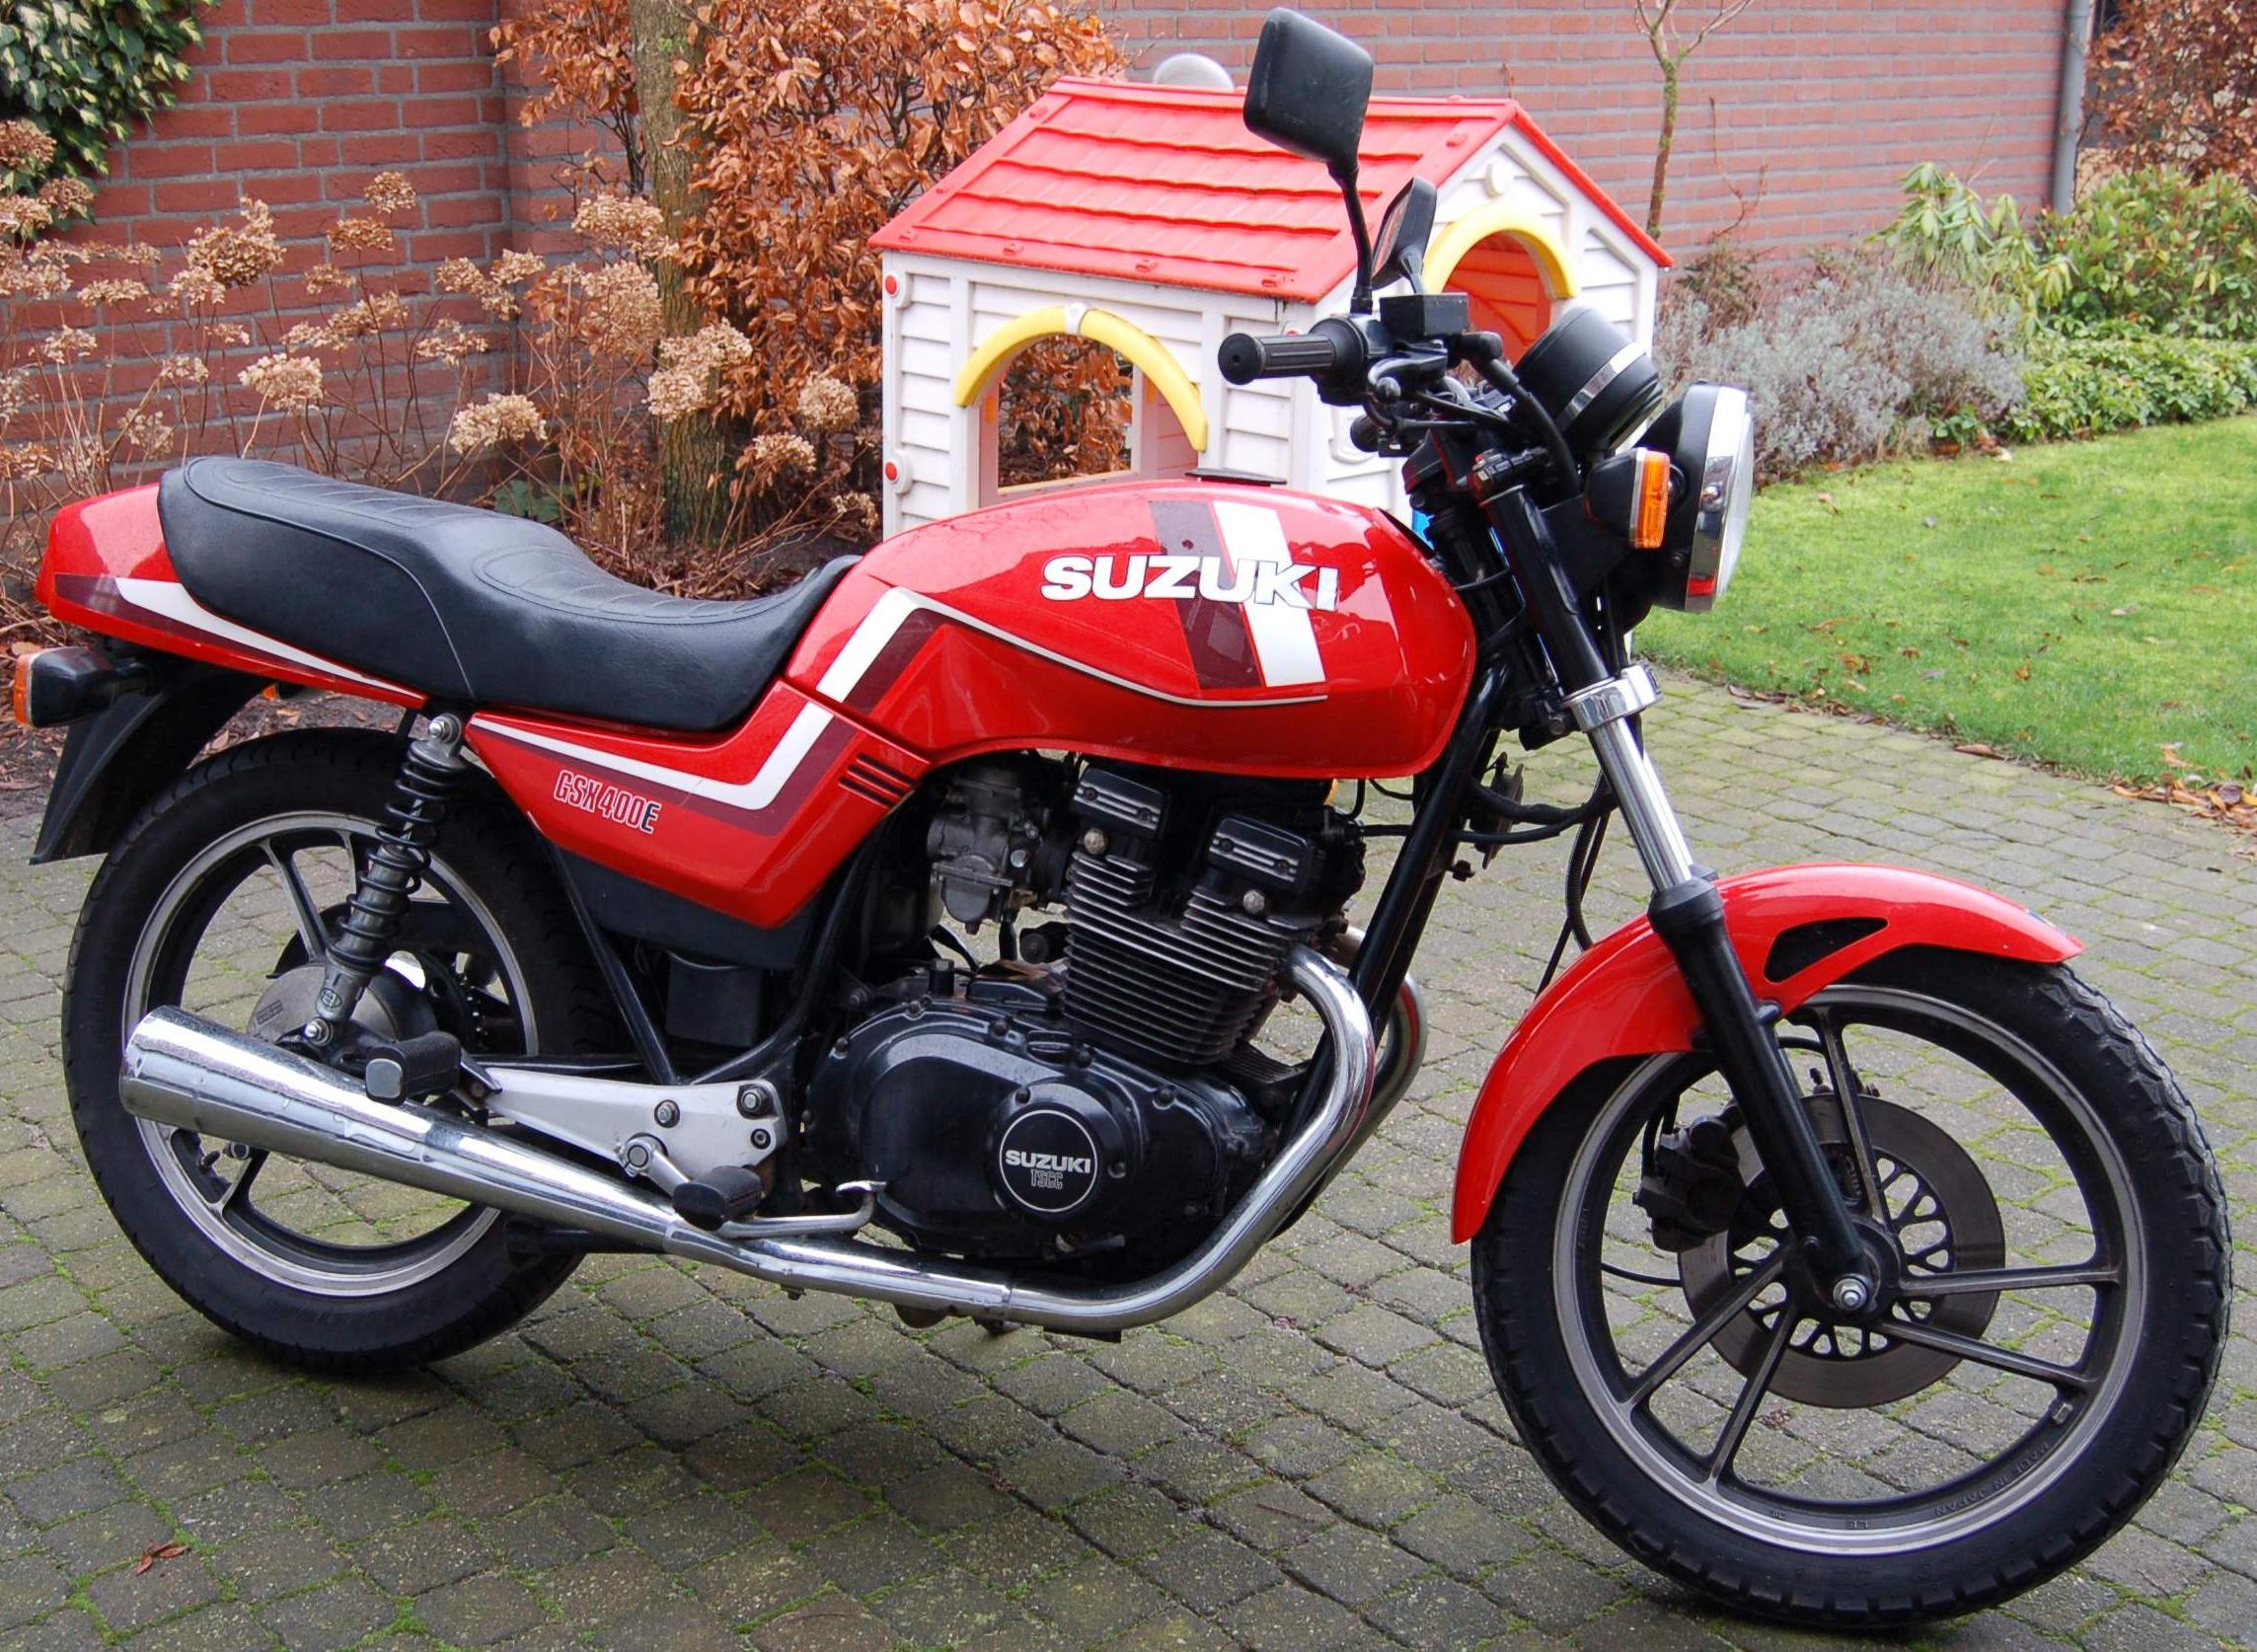 Suzuki gsx400e Caferacer - Brikken en klassiekers - Motor ...